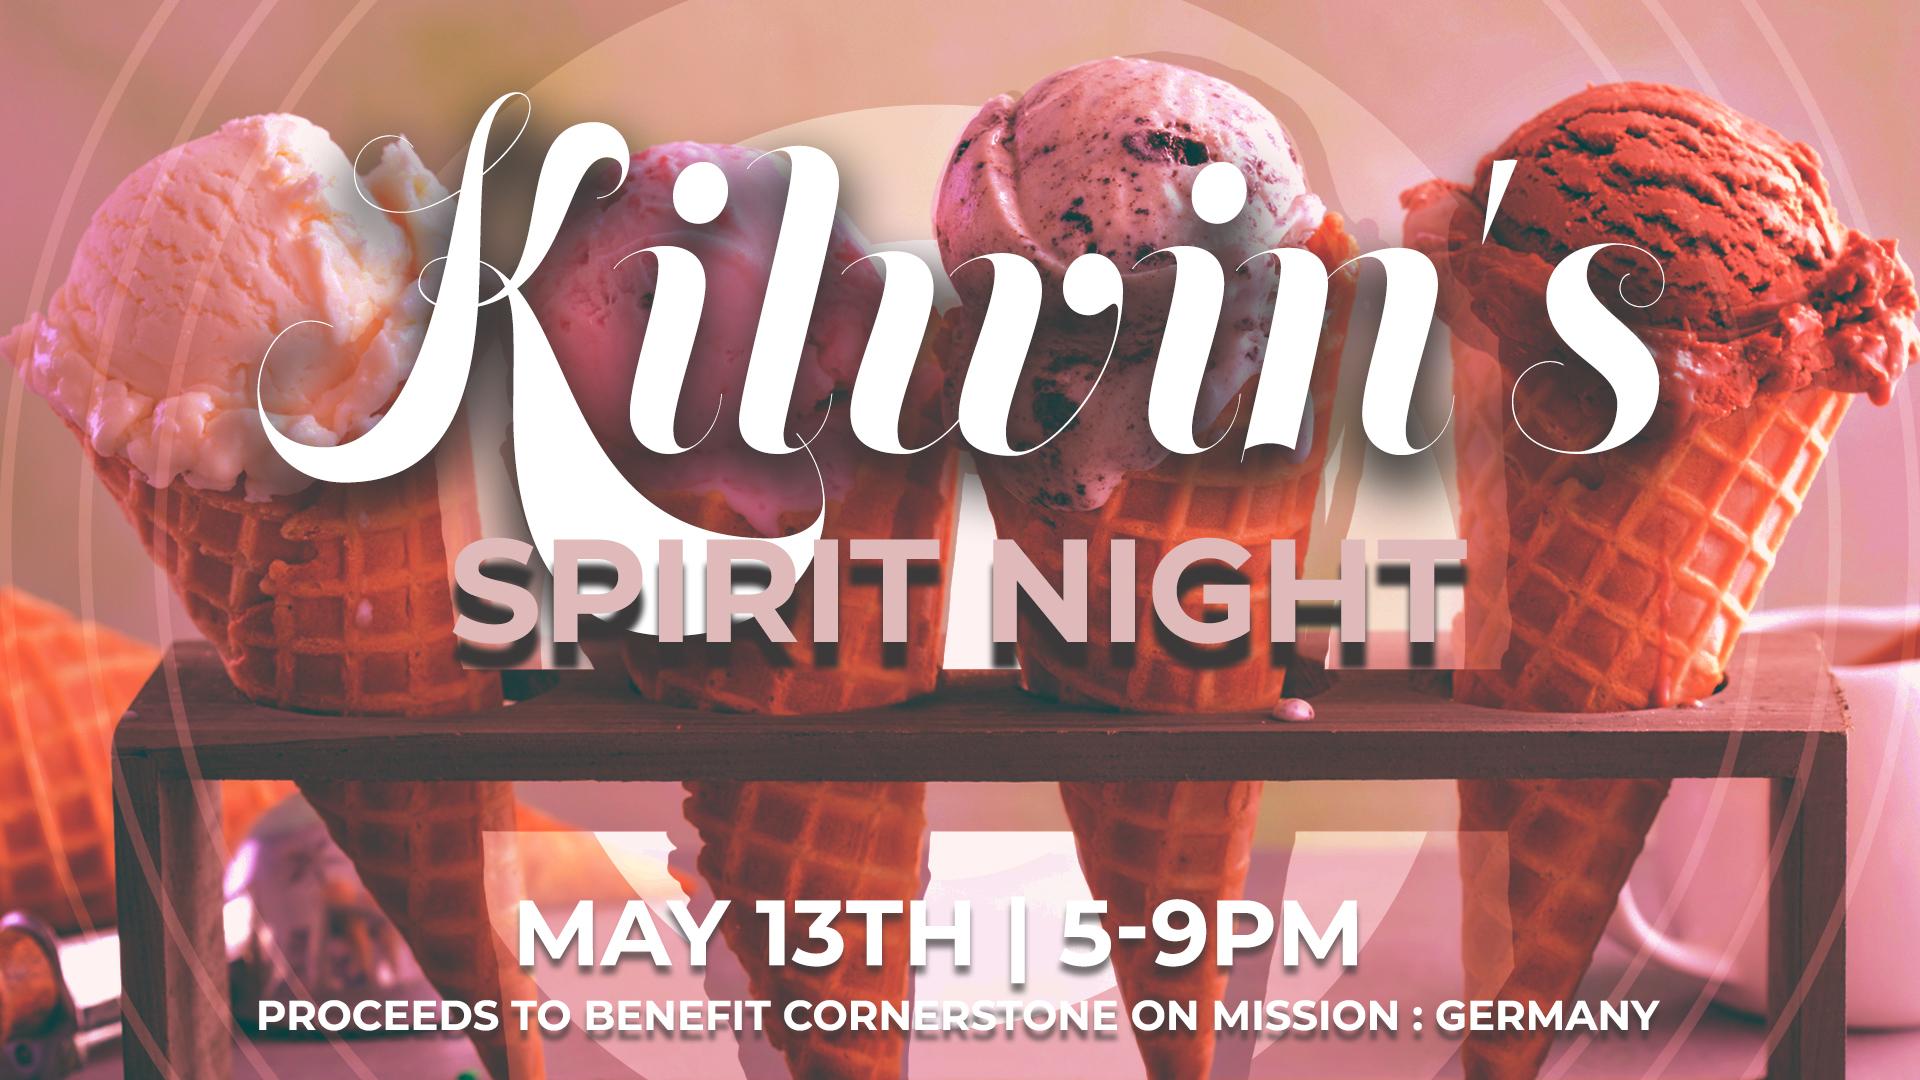 Kilwin's-May.jpg